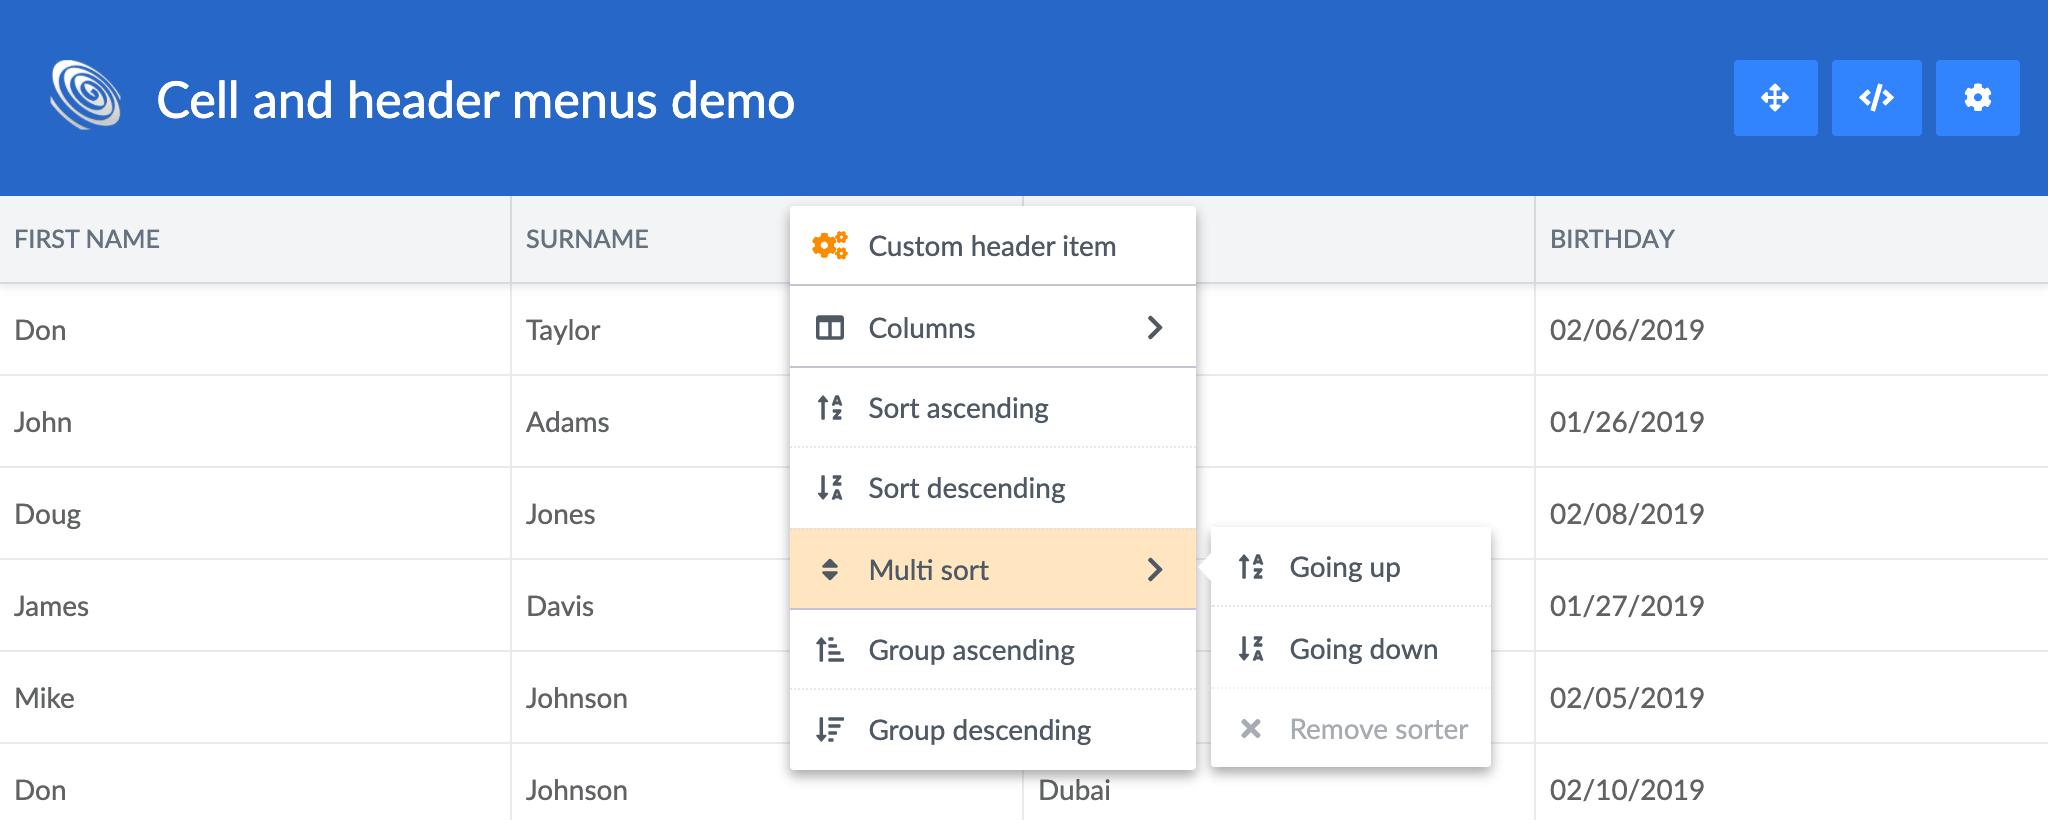 Customized header menus